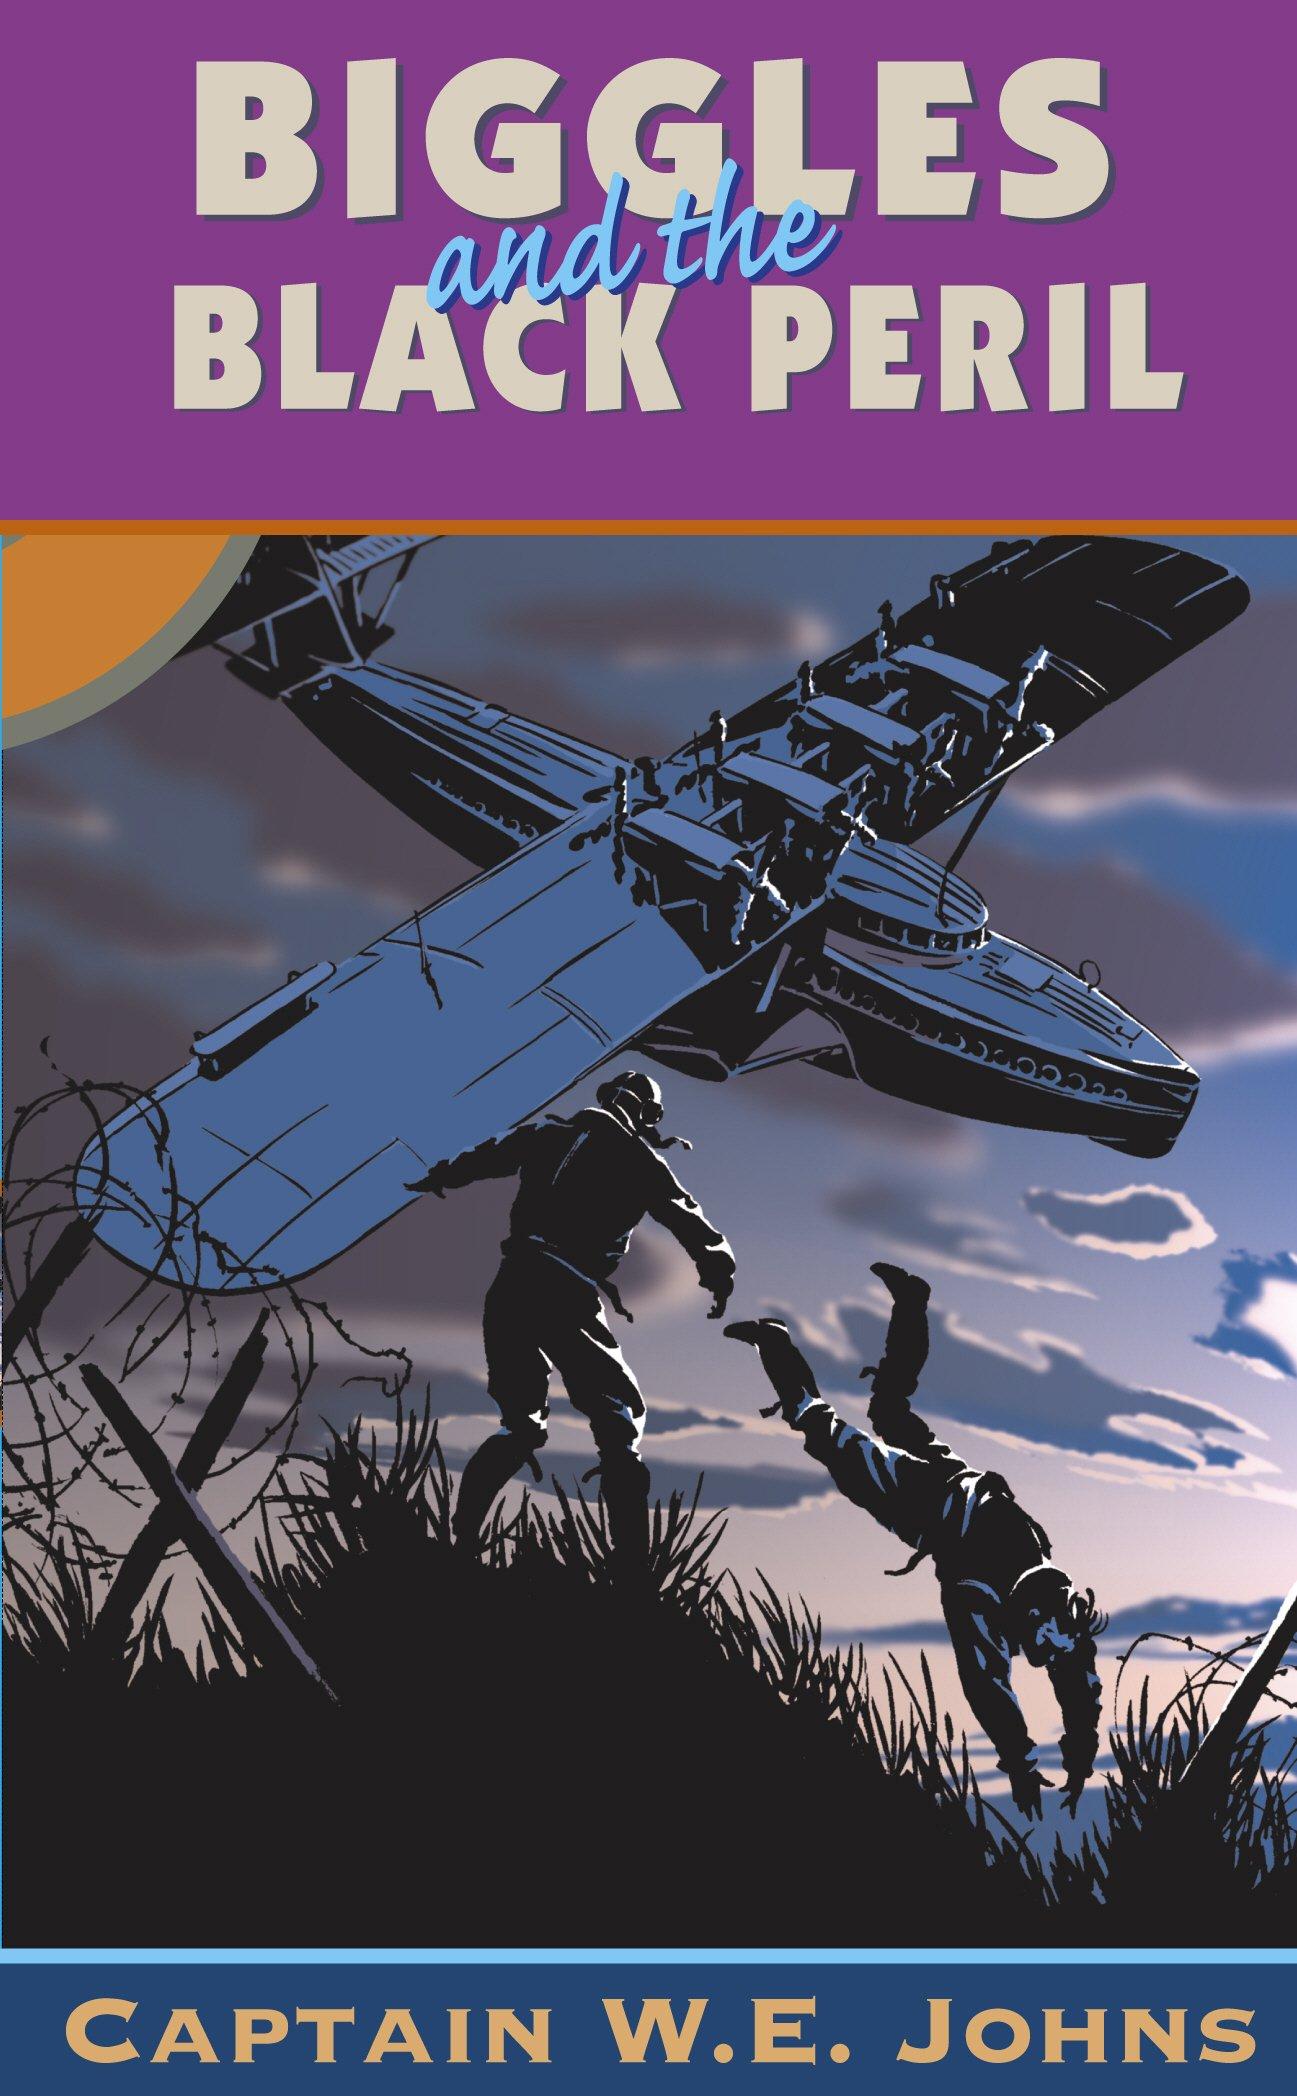 Biggles and the Black Peril (Red Fox Older Fiction): W.E. JOHNS:  9780099977605: Amazon.com: Books